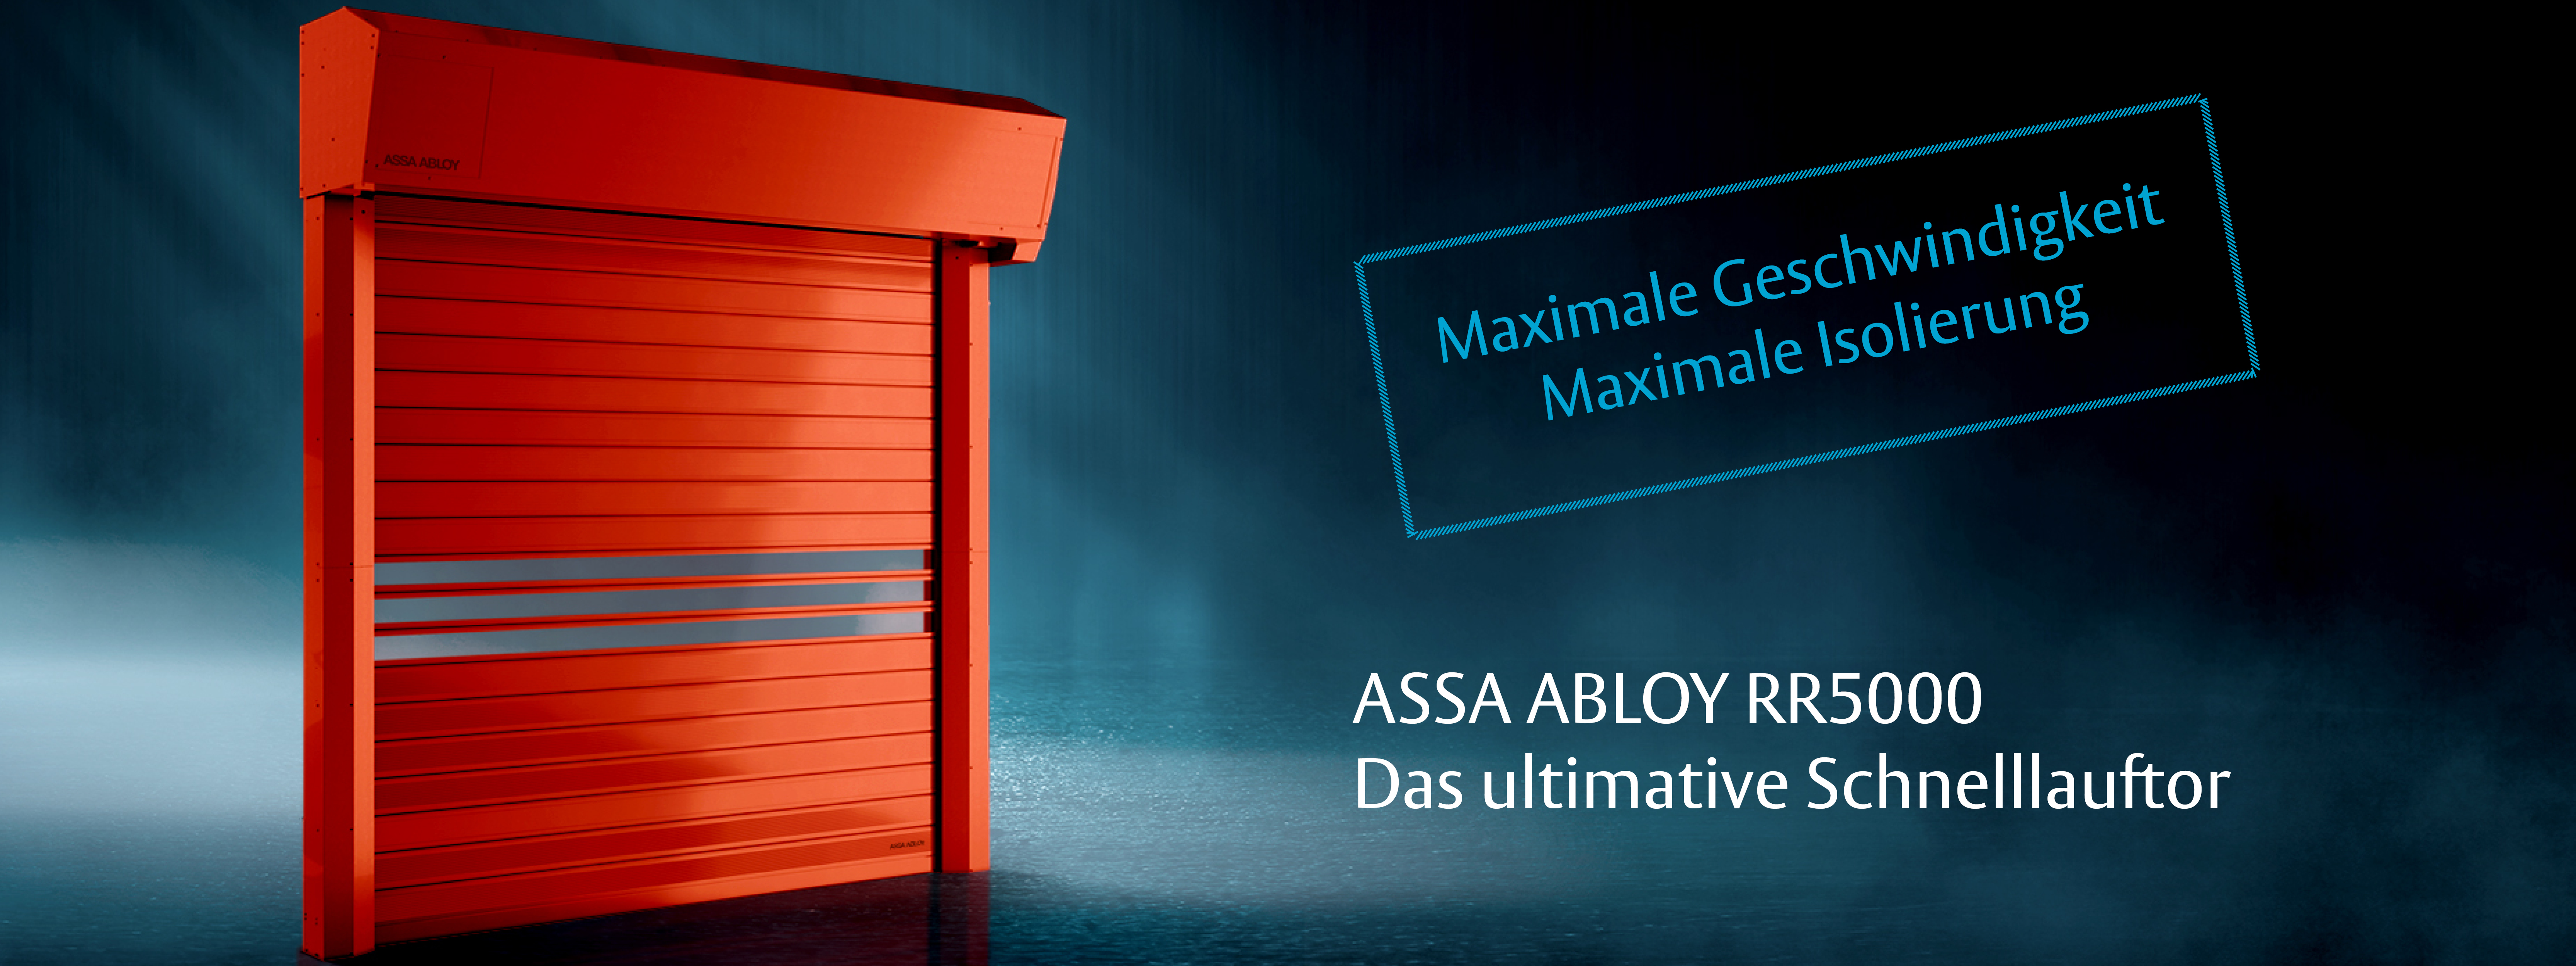 Schnelllauftor ASSA ABLOY RR5000